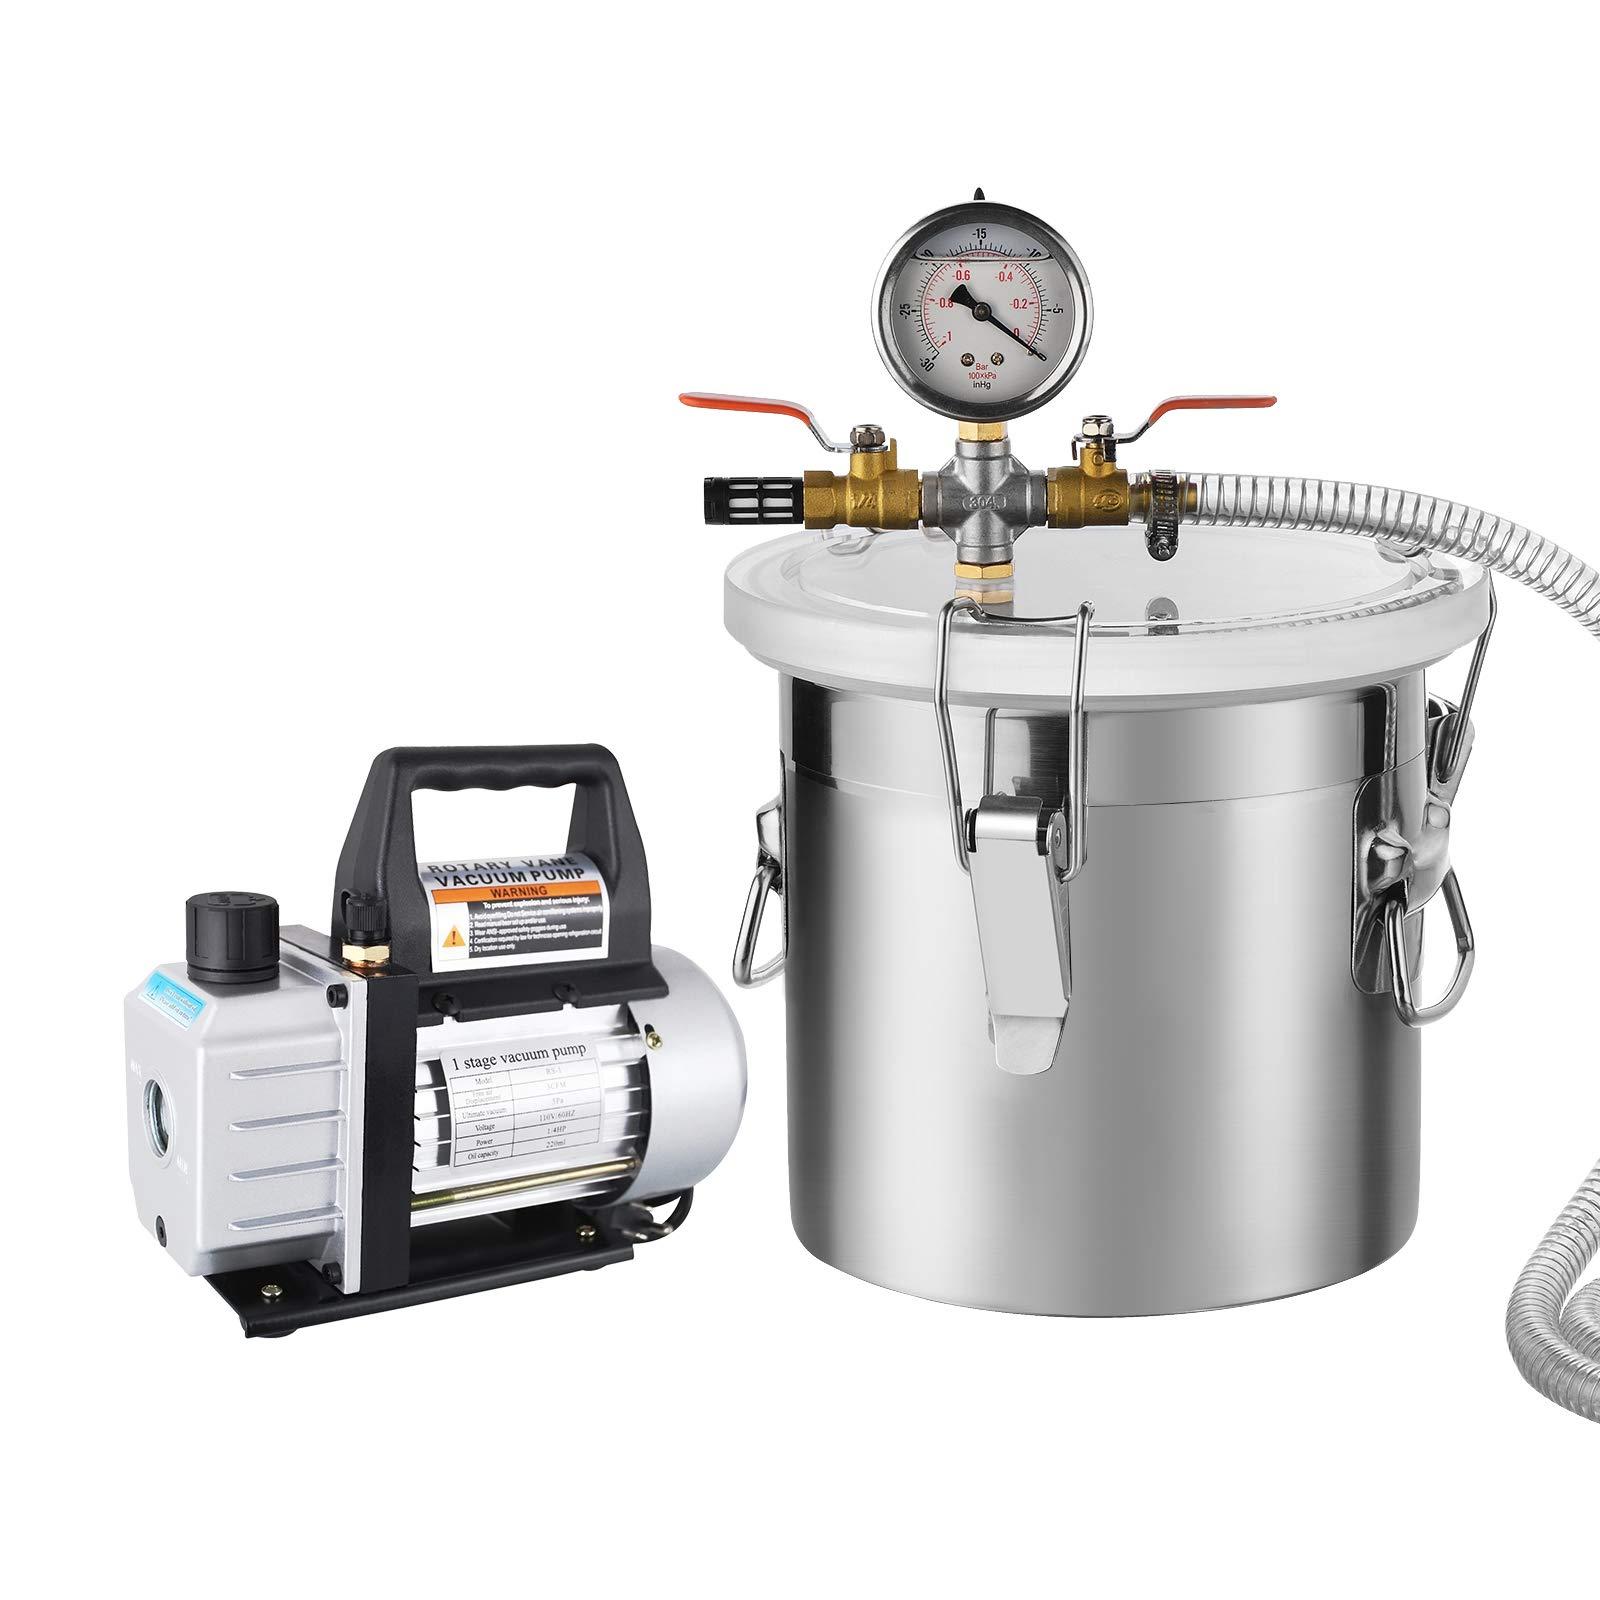 SUNCOO Vacuum Pump Kit,2 Gallon Vacuum Chamber with 5CFM Single Stage Vacuum Pump, Black